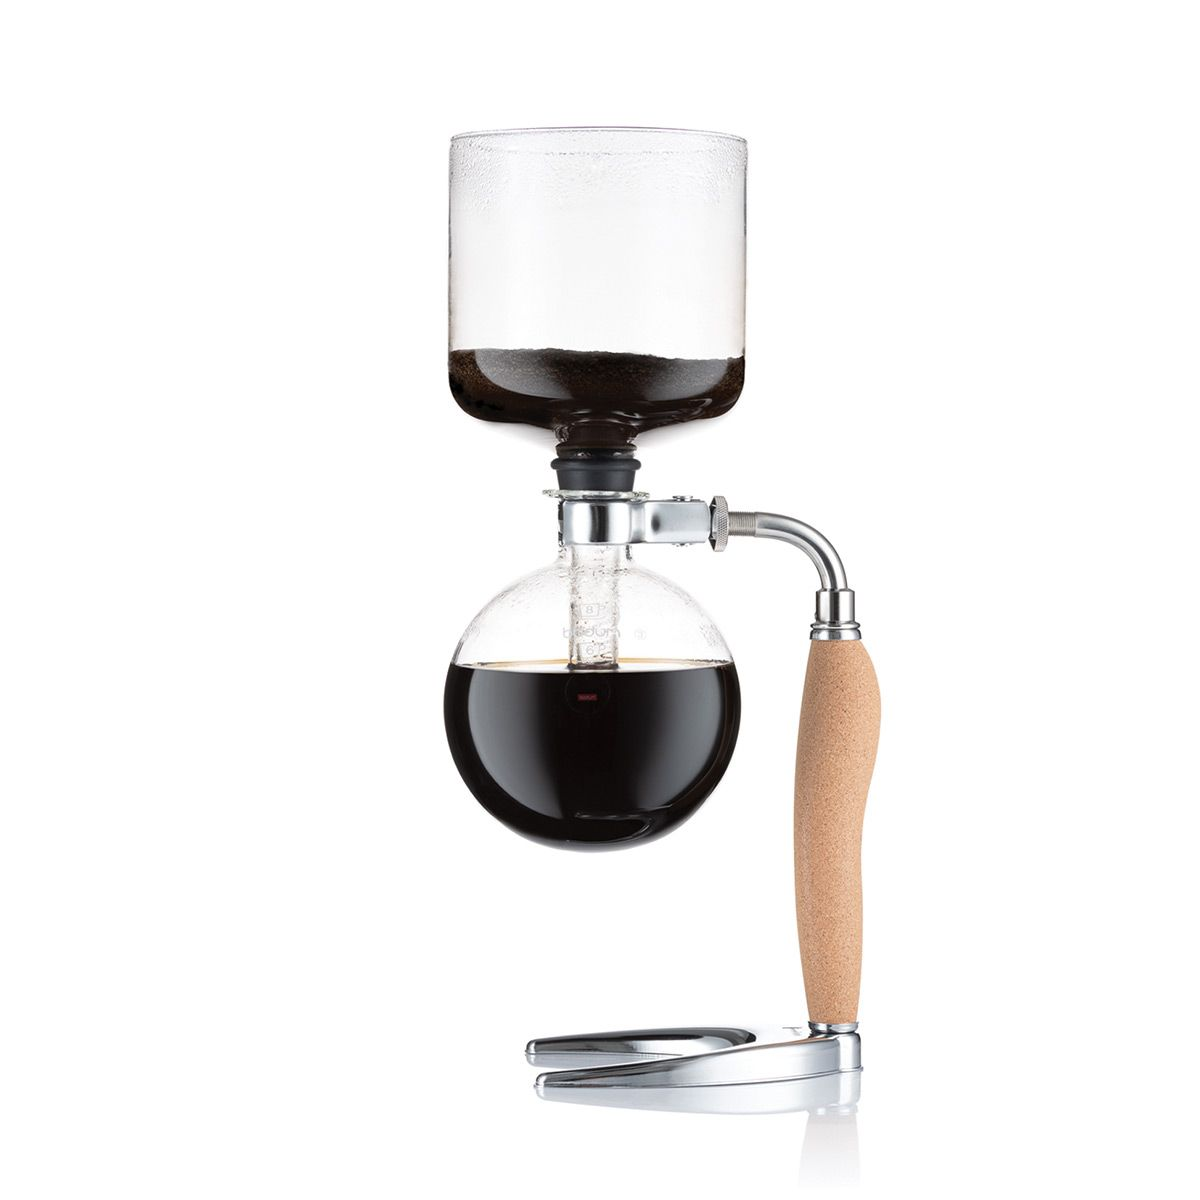 Vacuum Coffee Maker MOCCA Bodum